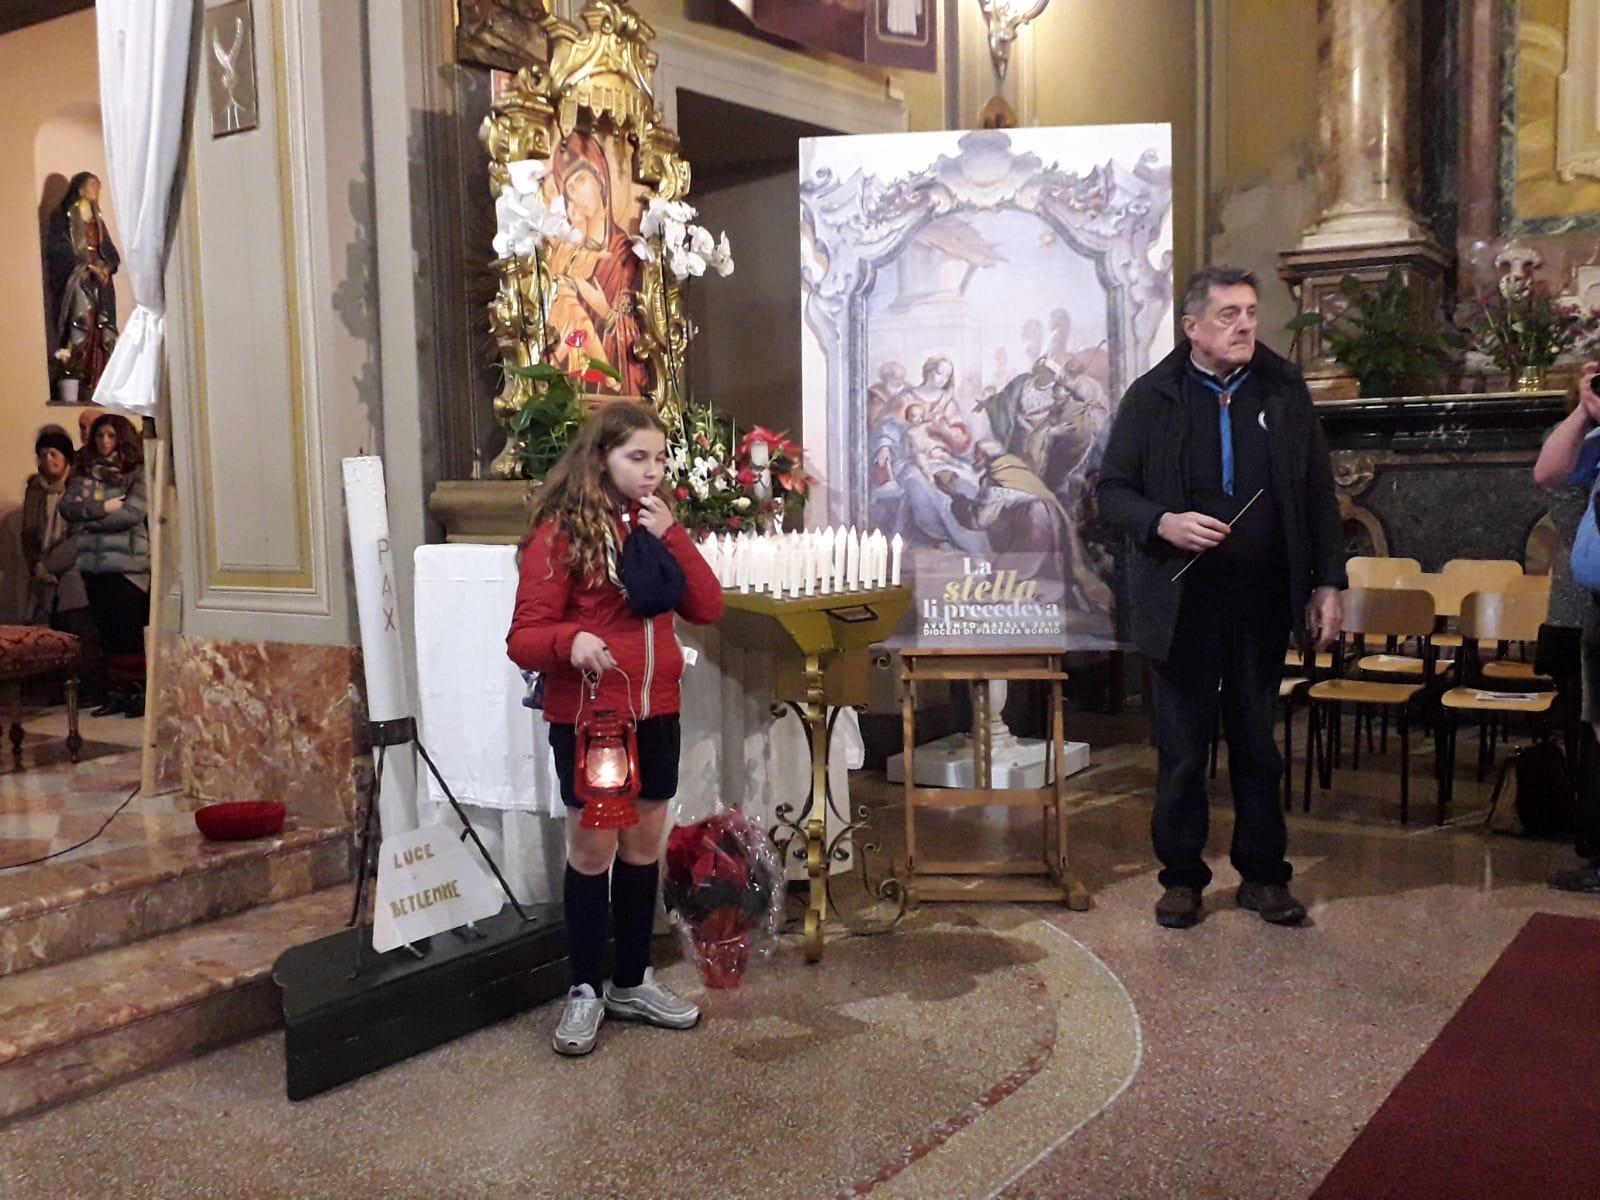 Luce di Betlemme 2019 santa messa (21)